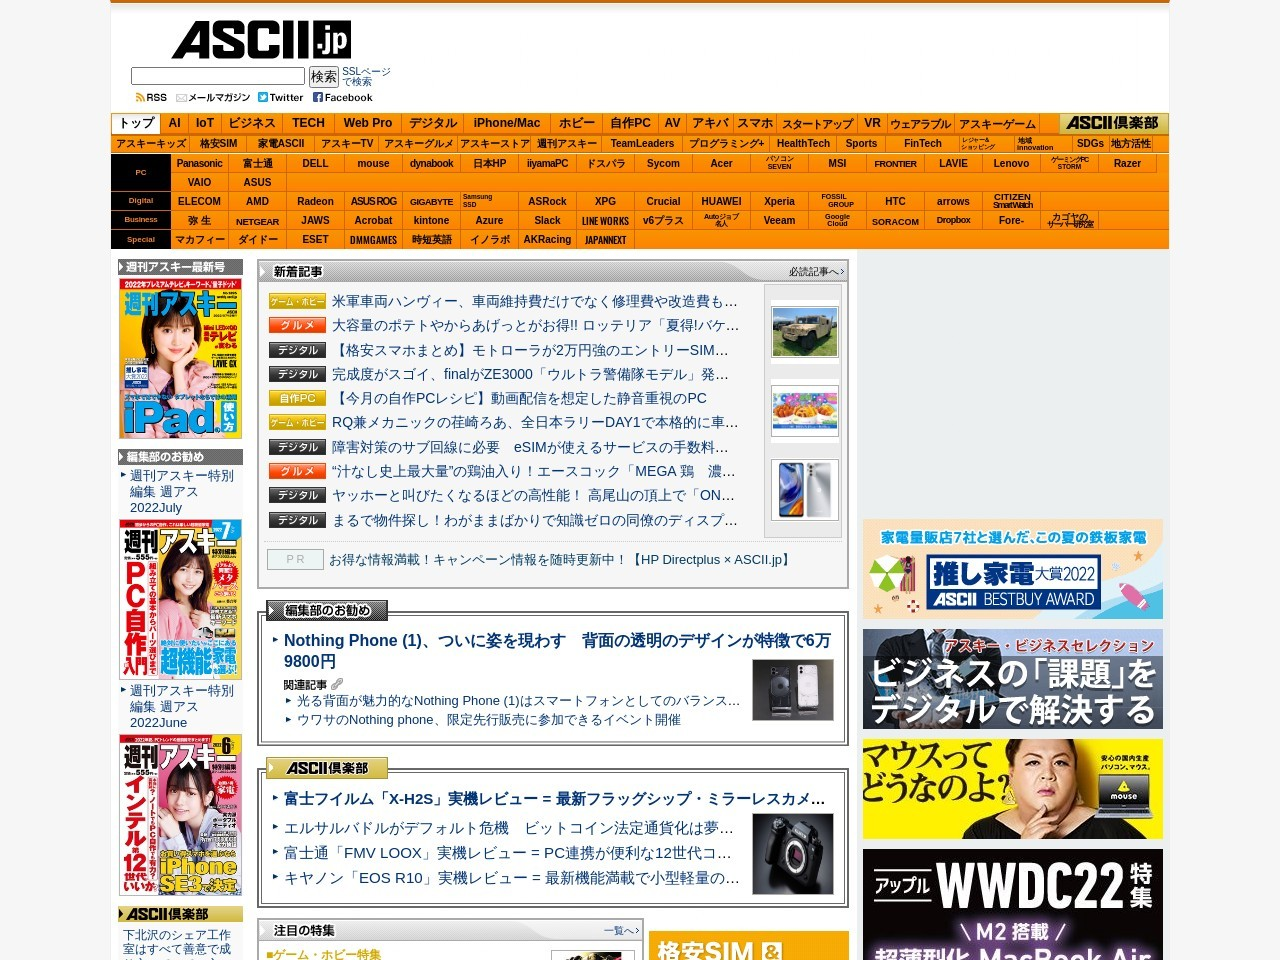 http://ascii.jp/elem/000/000/527/527707/